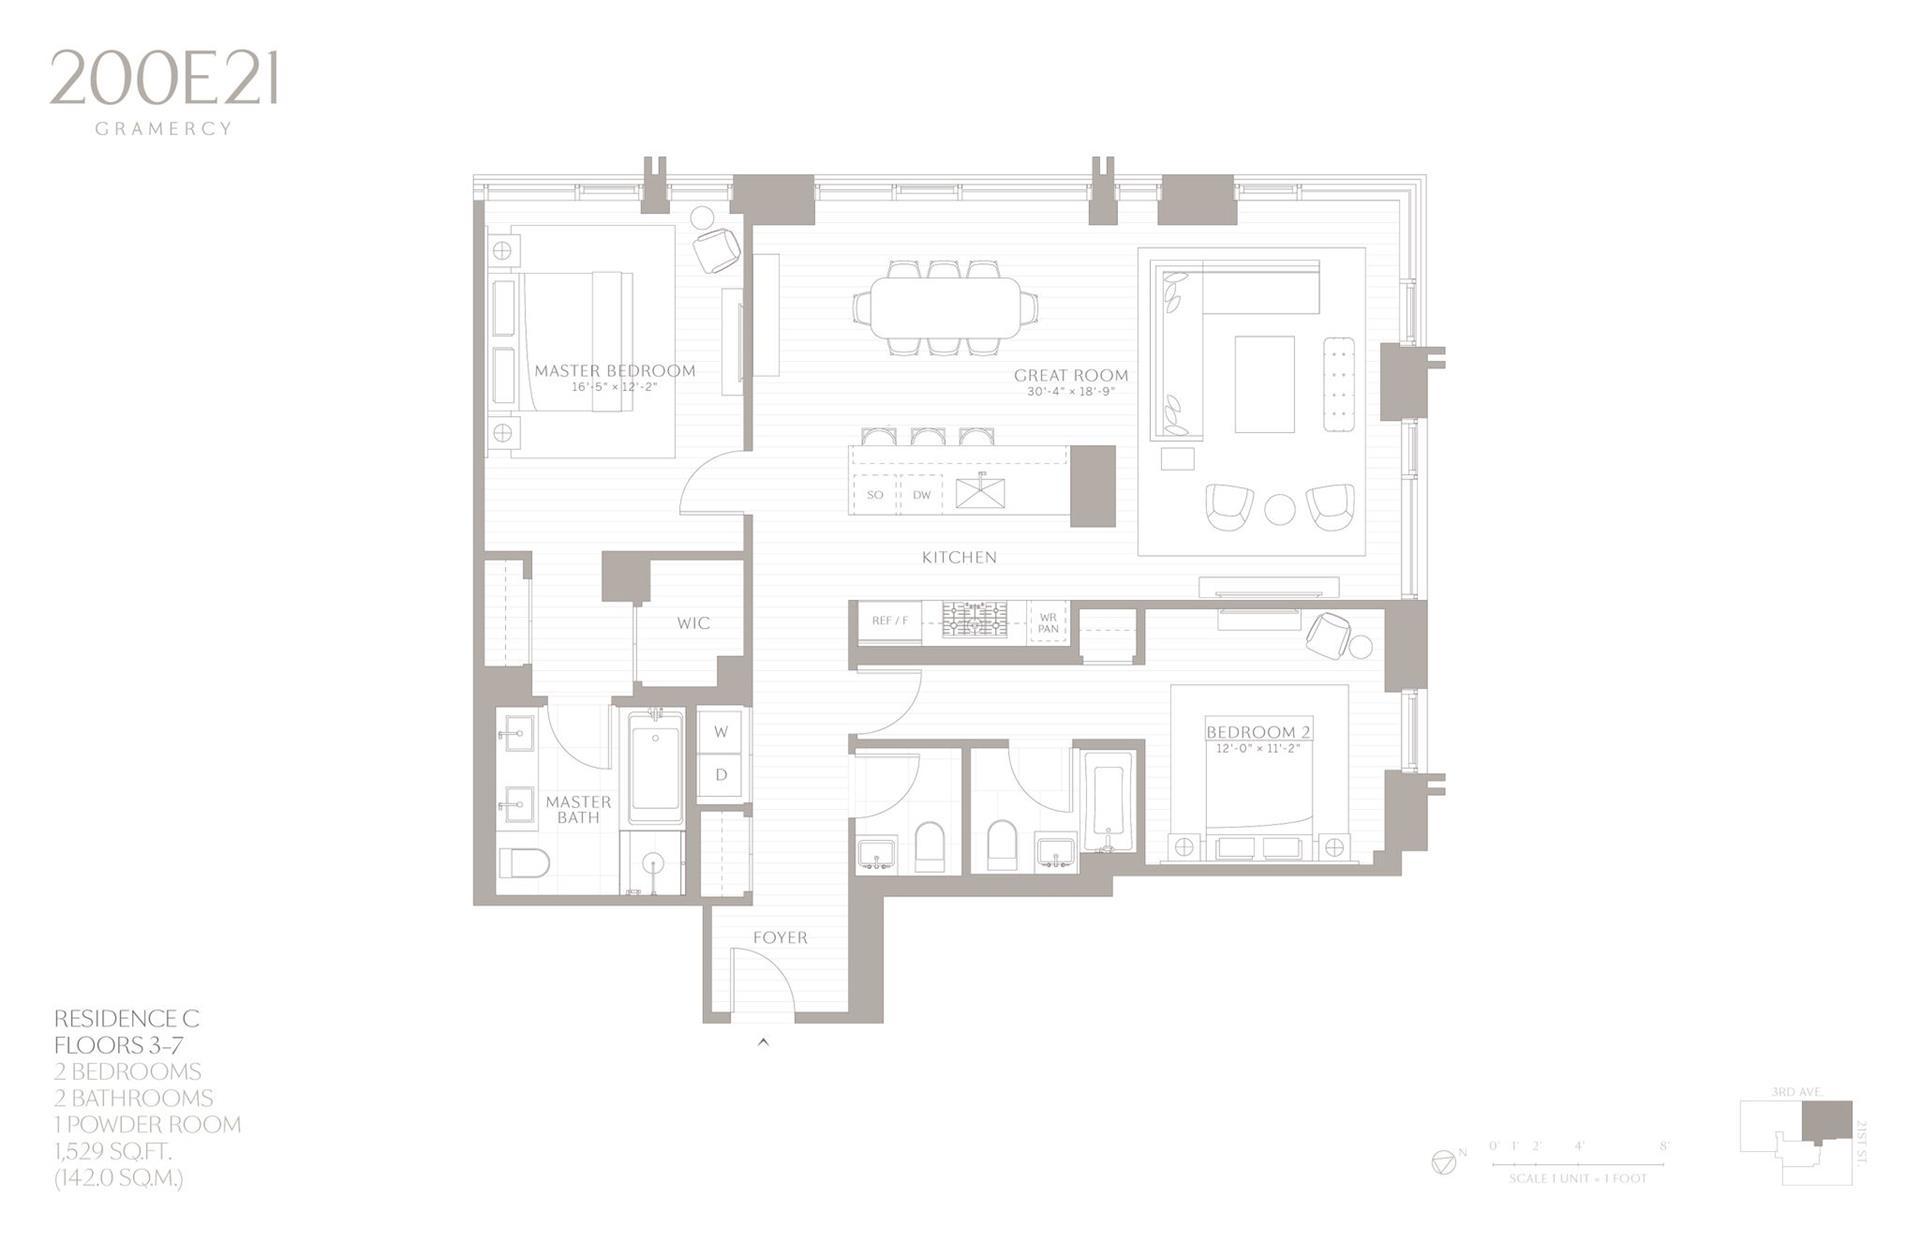 Floor plan of 200 East 21st Street, 6C - Gramercy - Union Square, New York